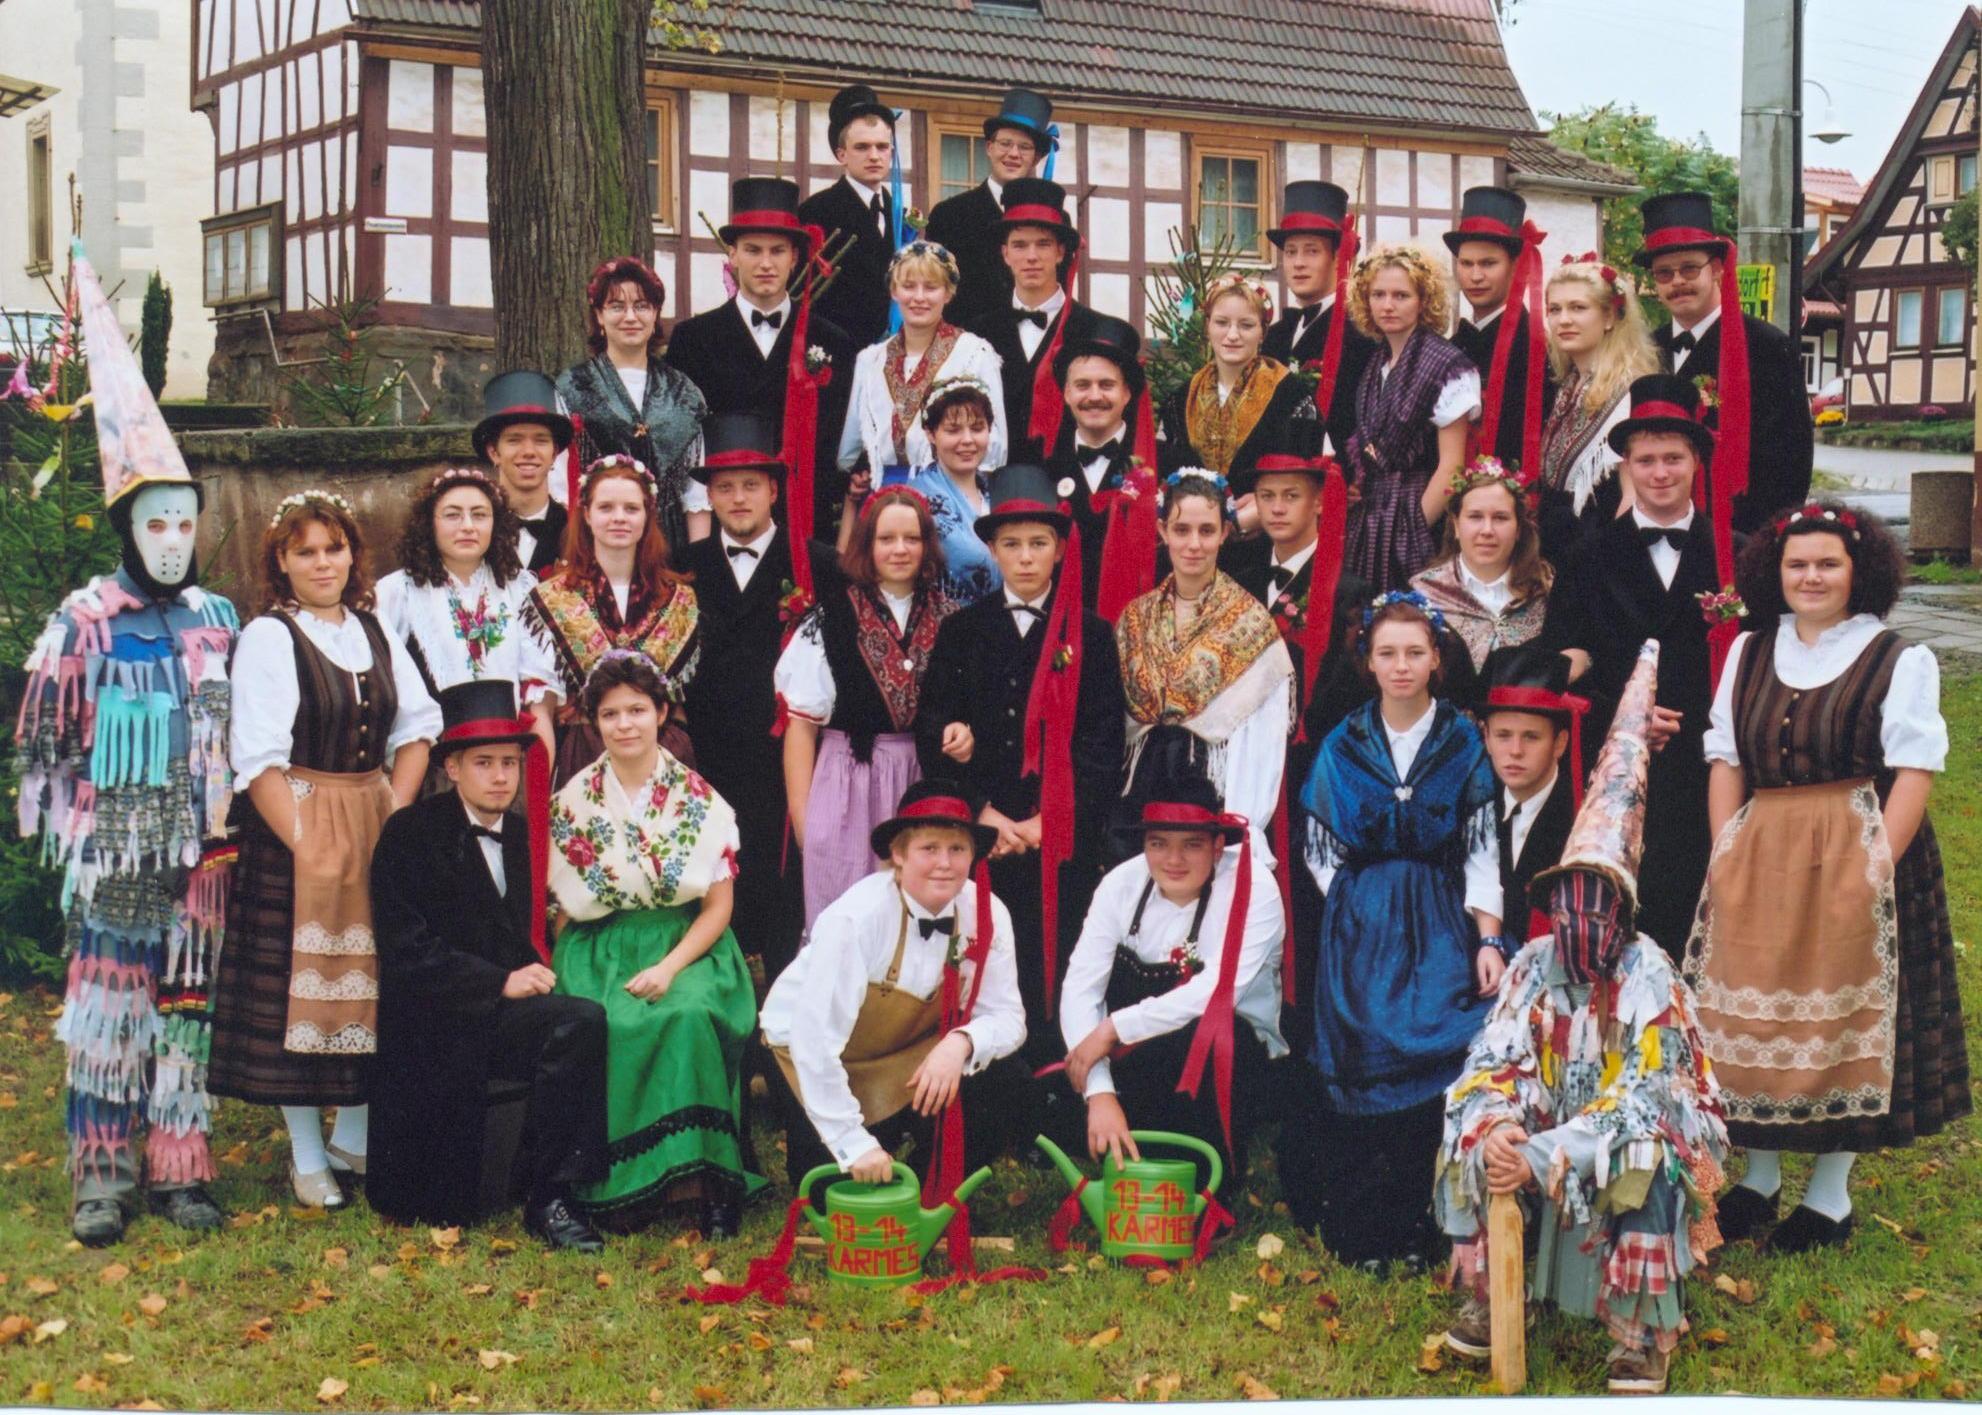 https://www.fraenkische-kirchweih.de/wp-content/uploads/2018/10/020-KirmesLinden-1999.jpg